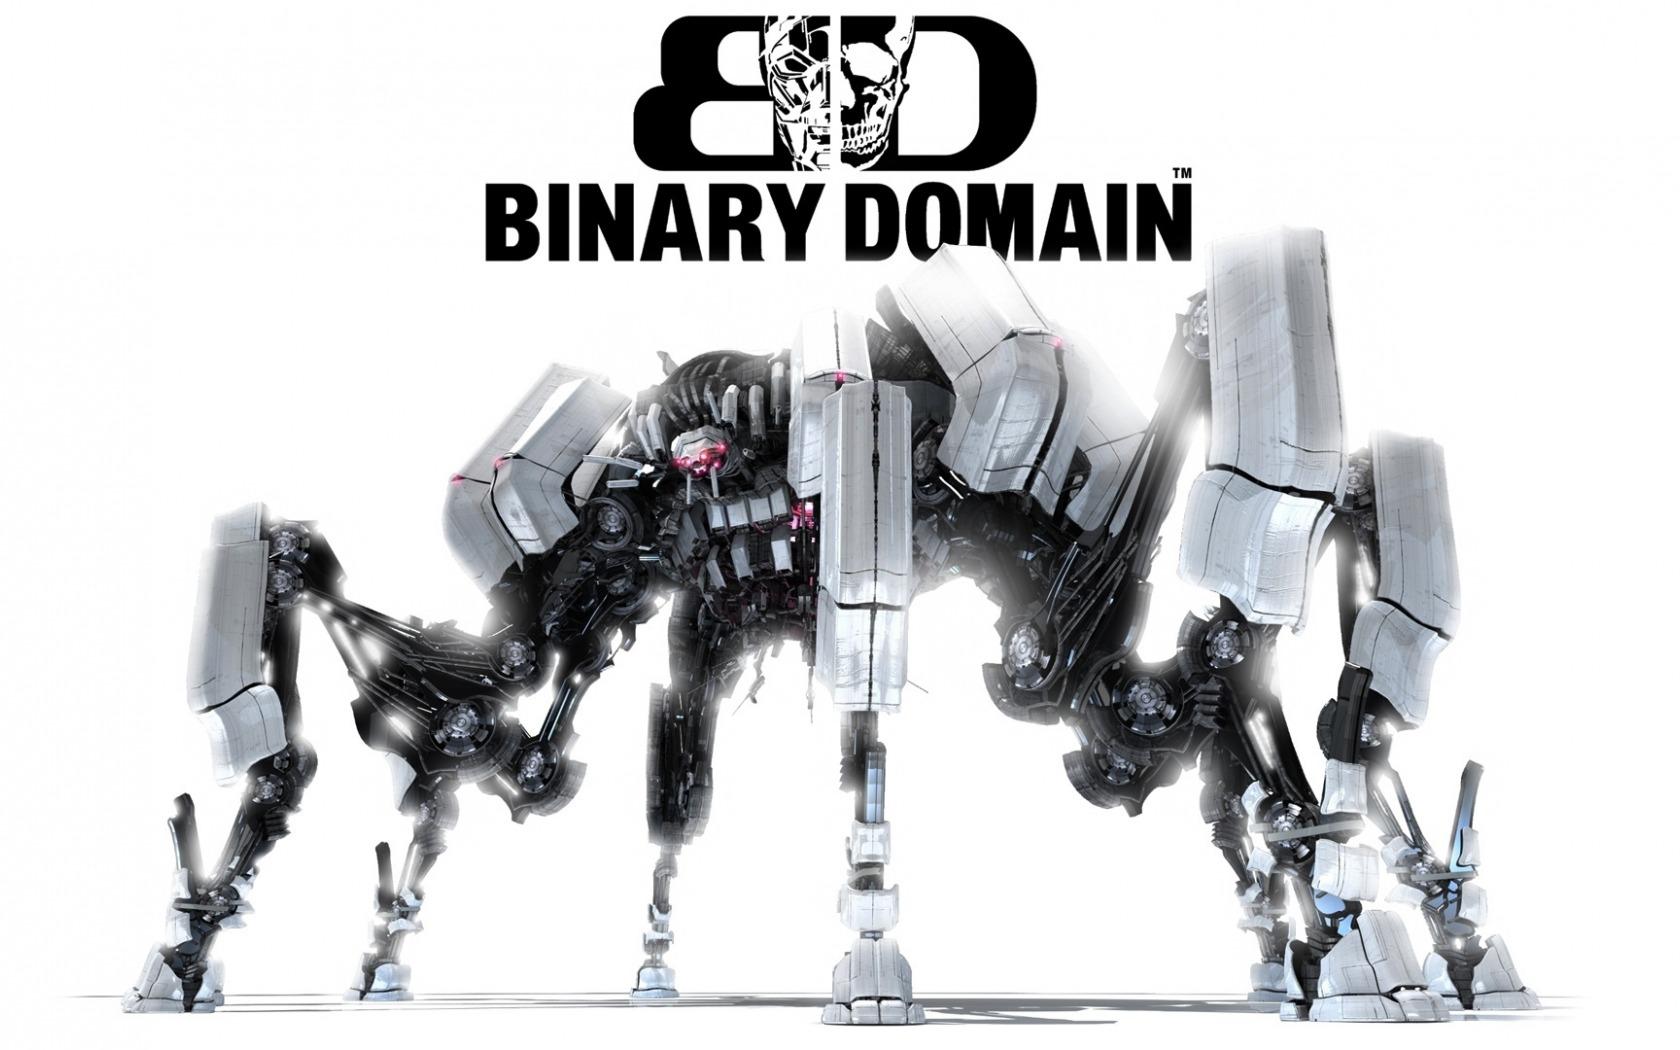 Binary domain no resolution options